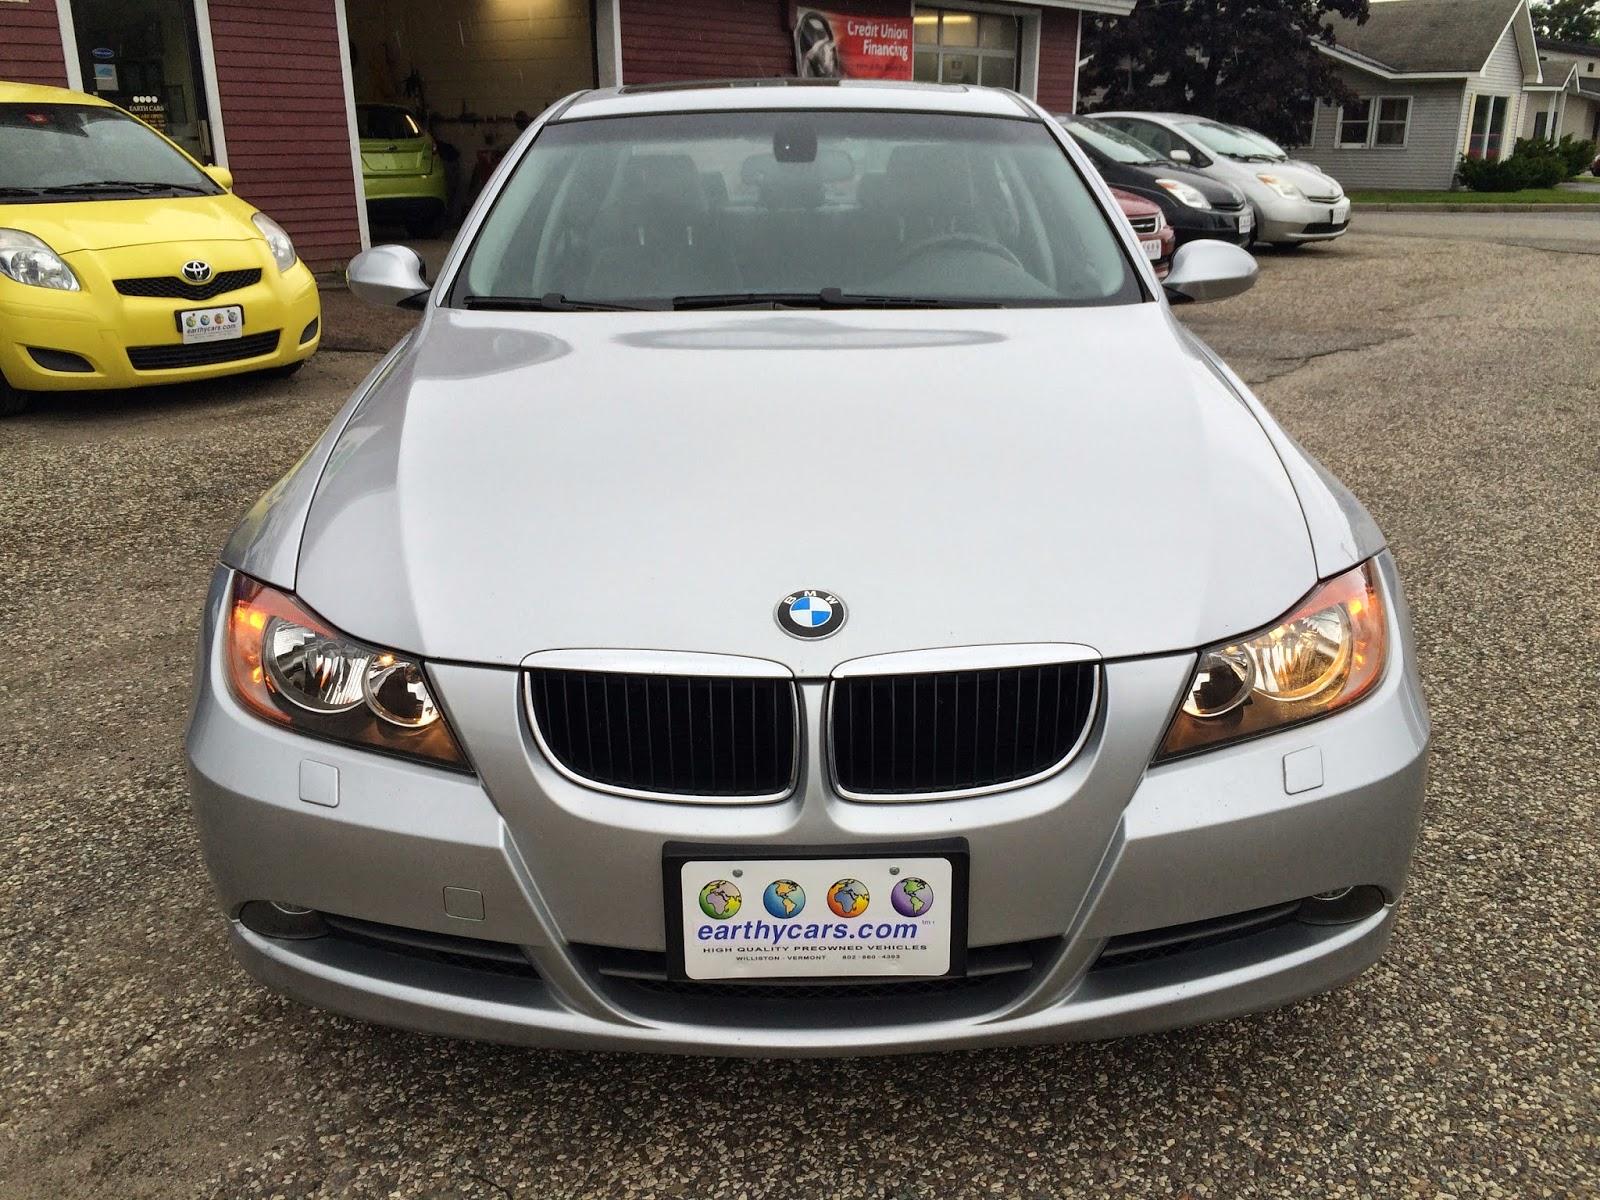 Earthy Cars Blog October 2014